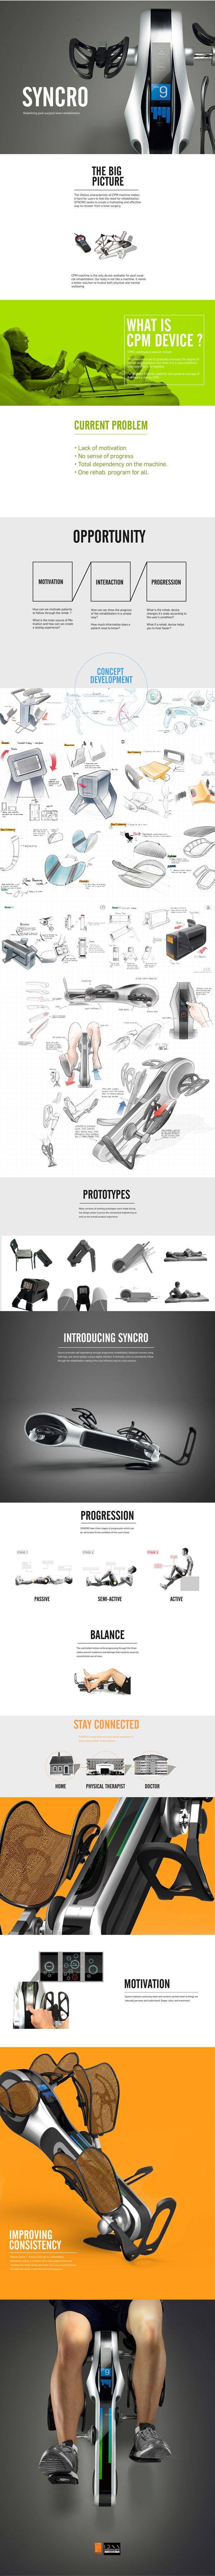 SYNCRO by James Cha, via Behance